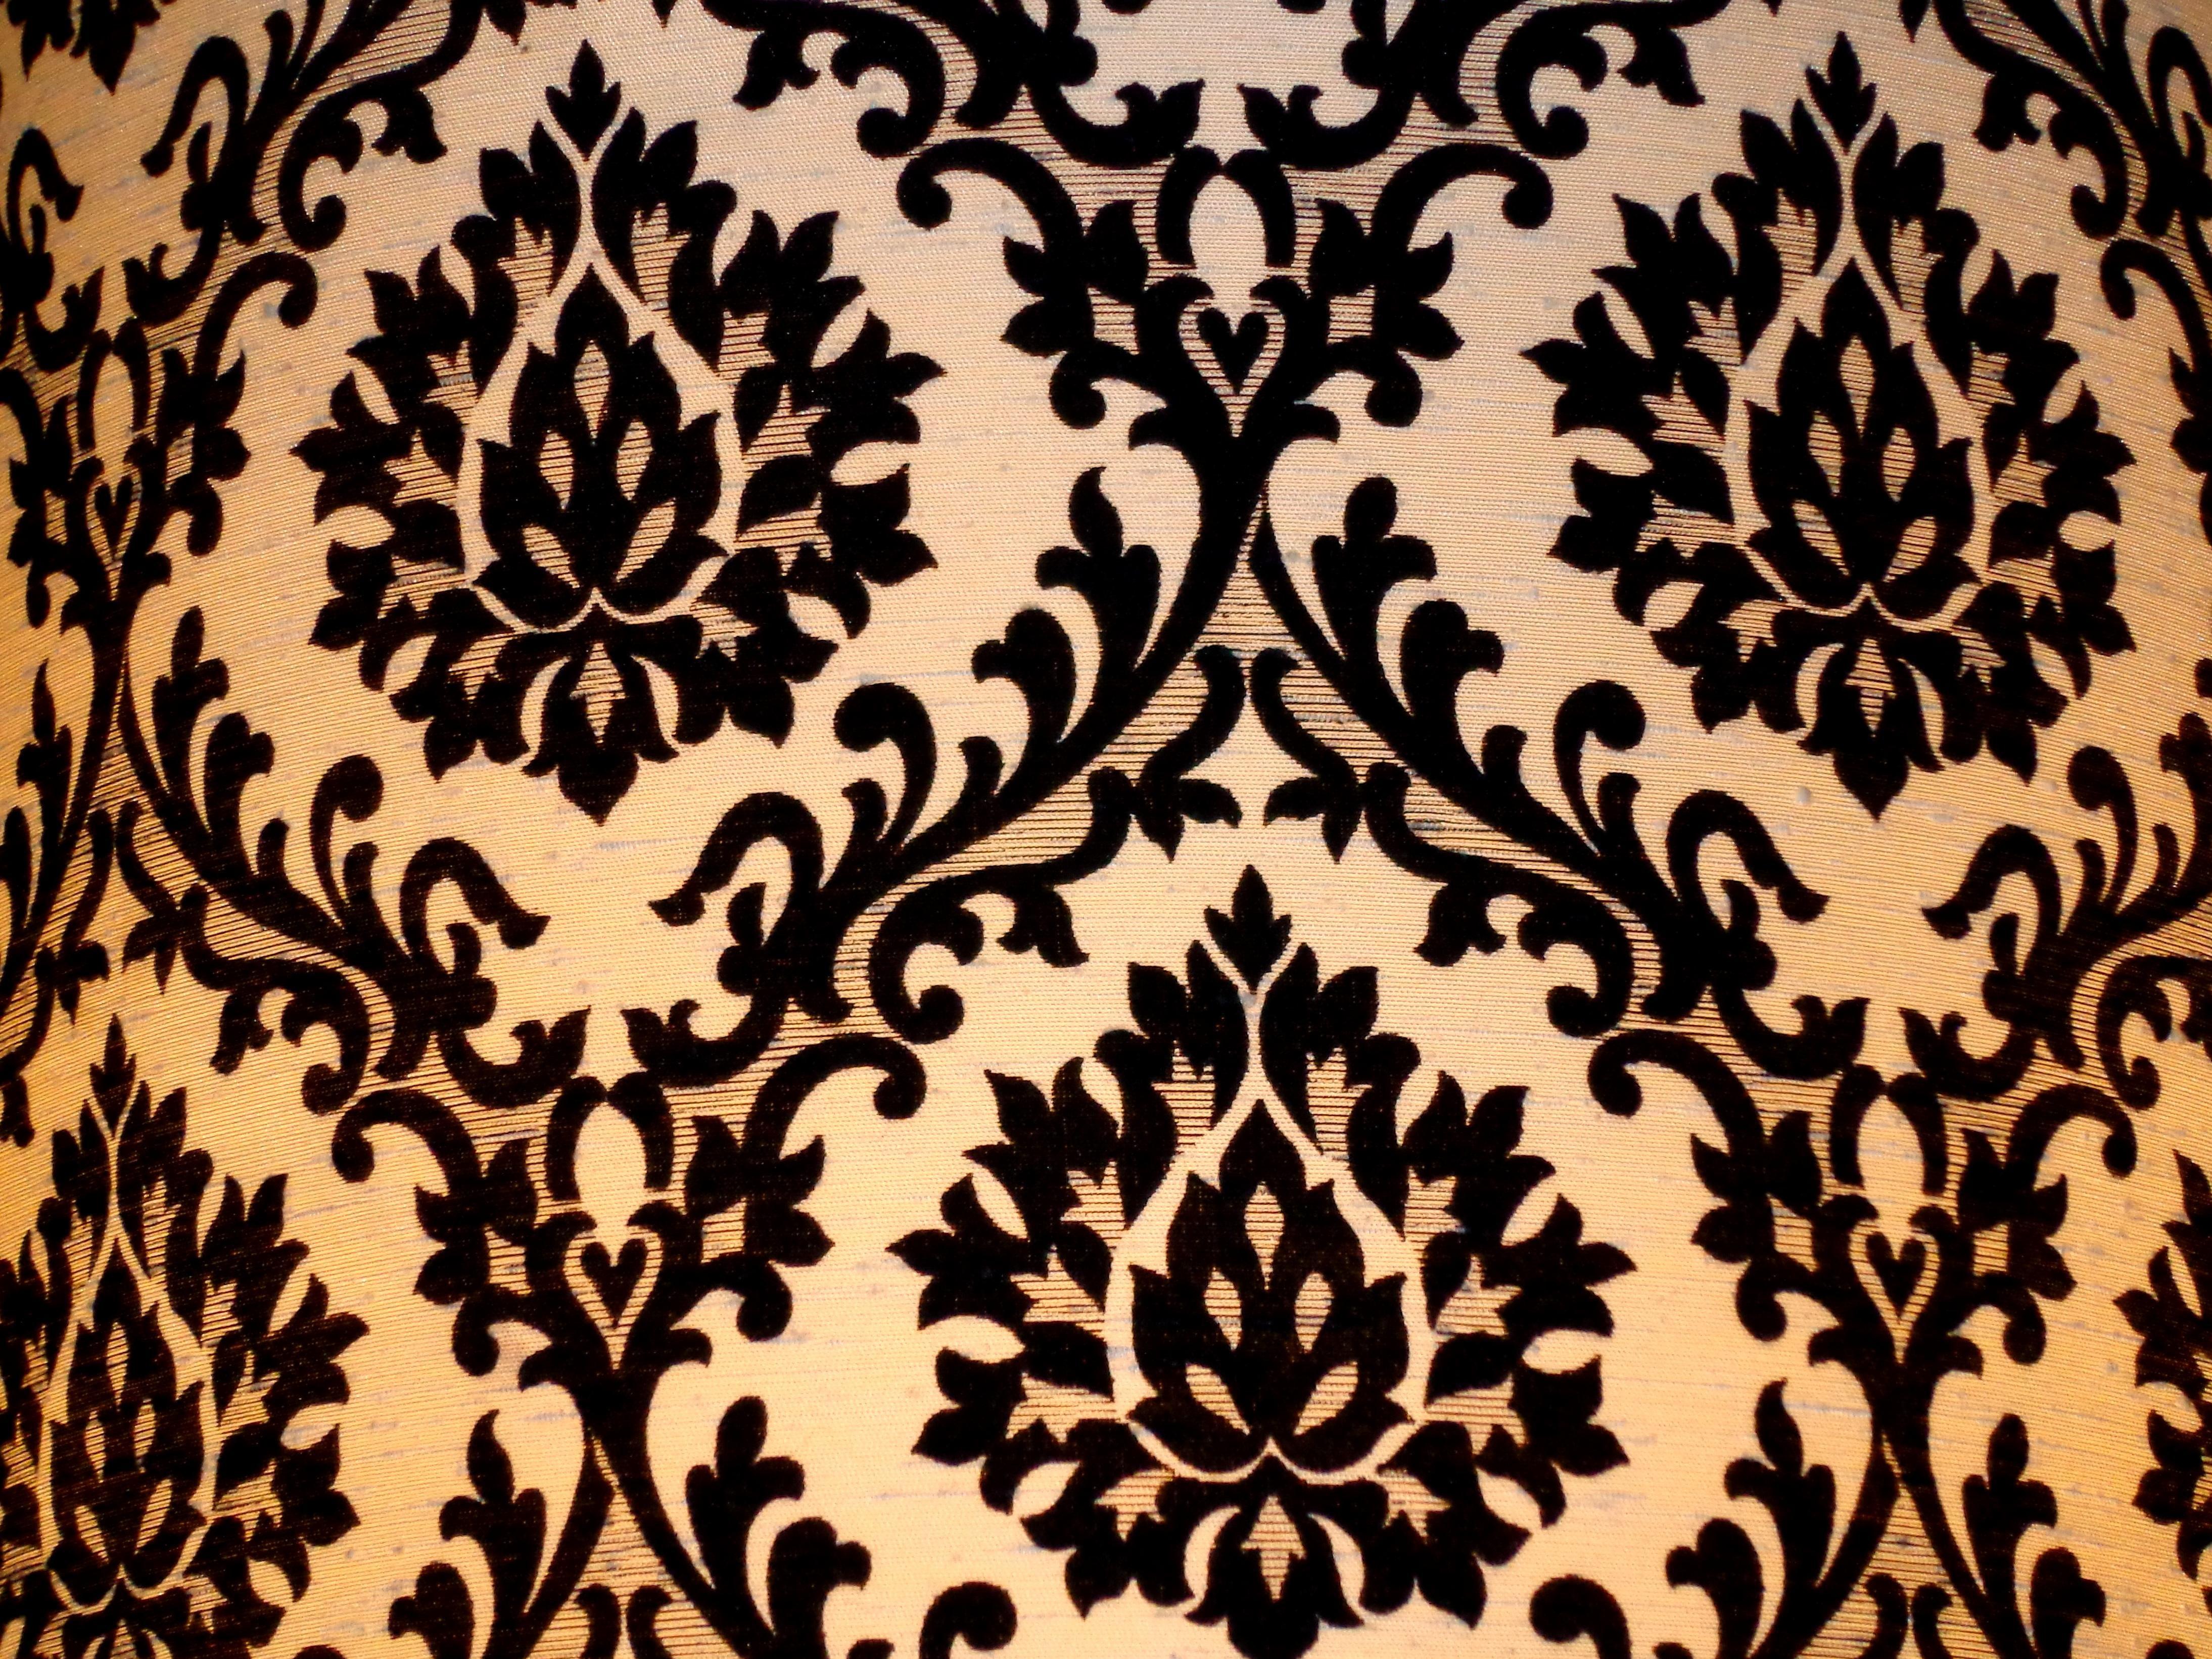 Lamp texture photo